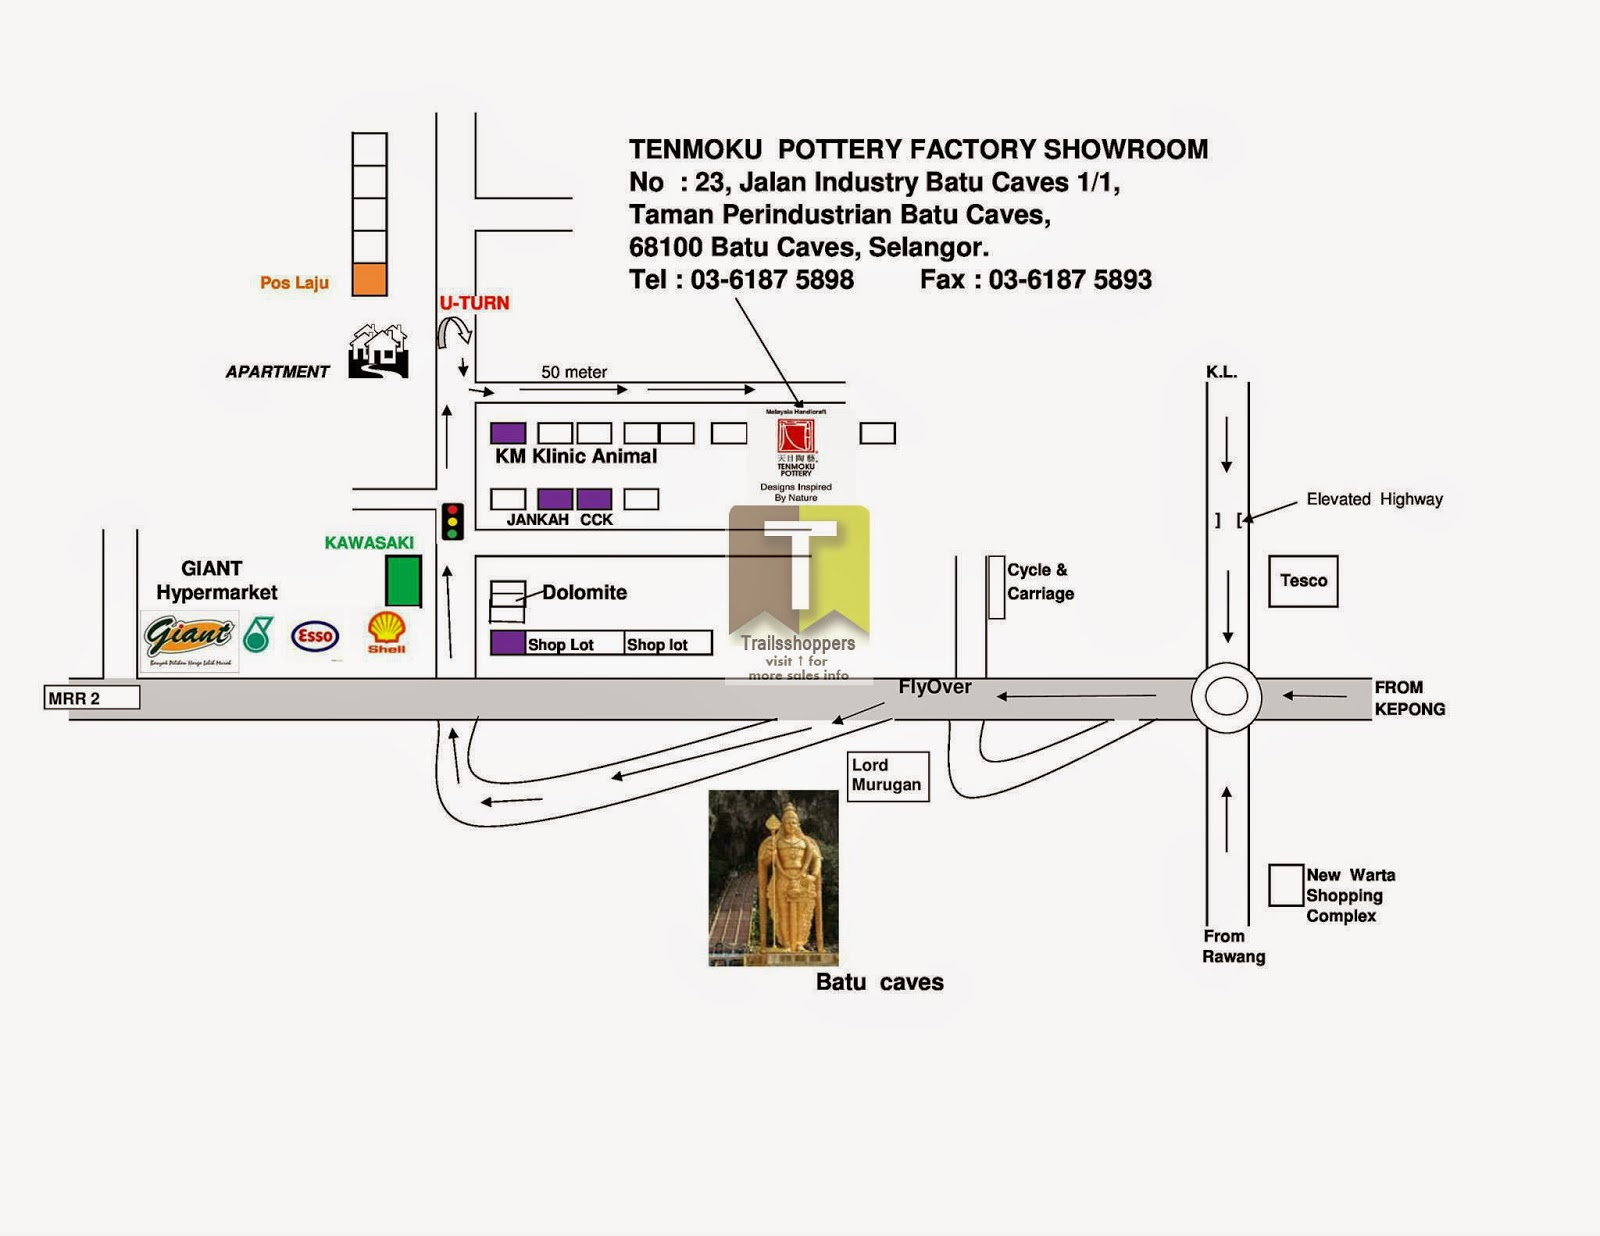 Tenmoku Pottery Warehouse Sale offers map batu caves